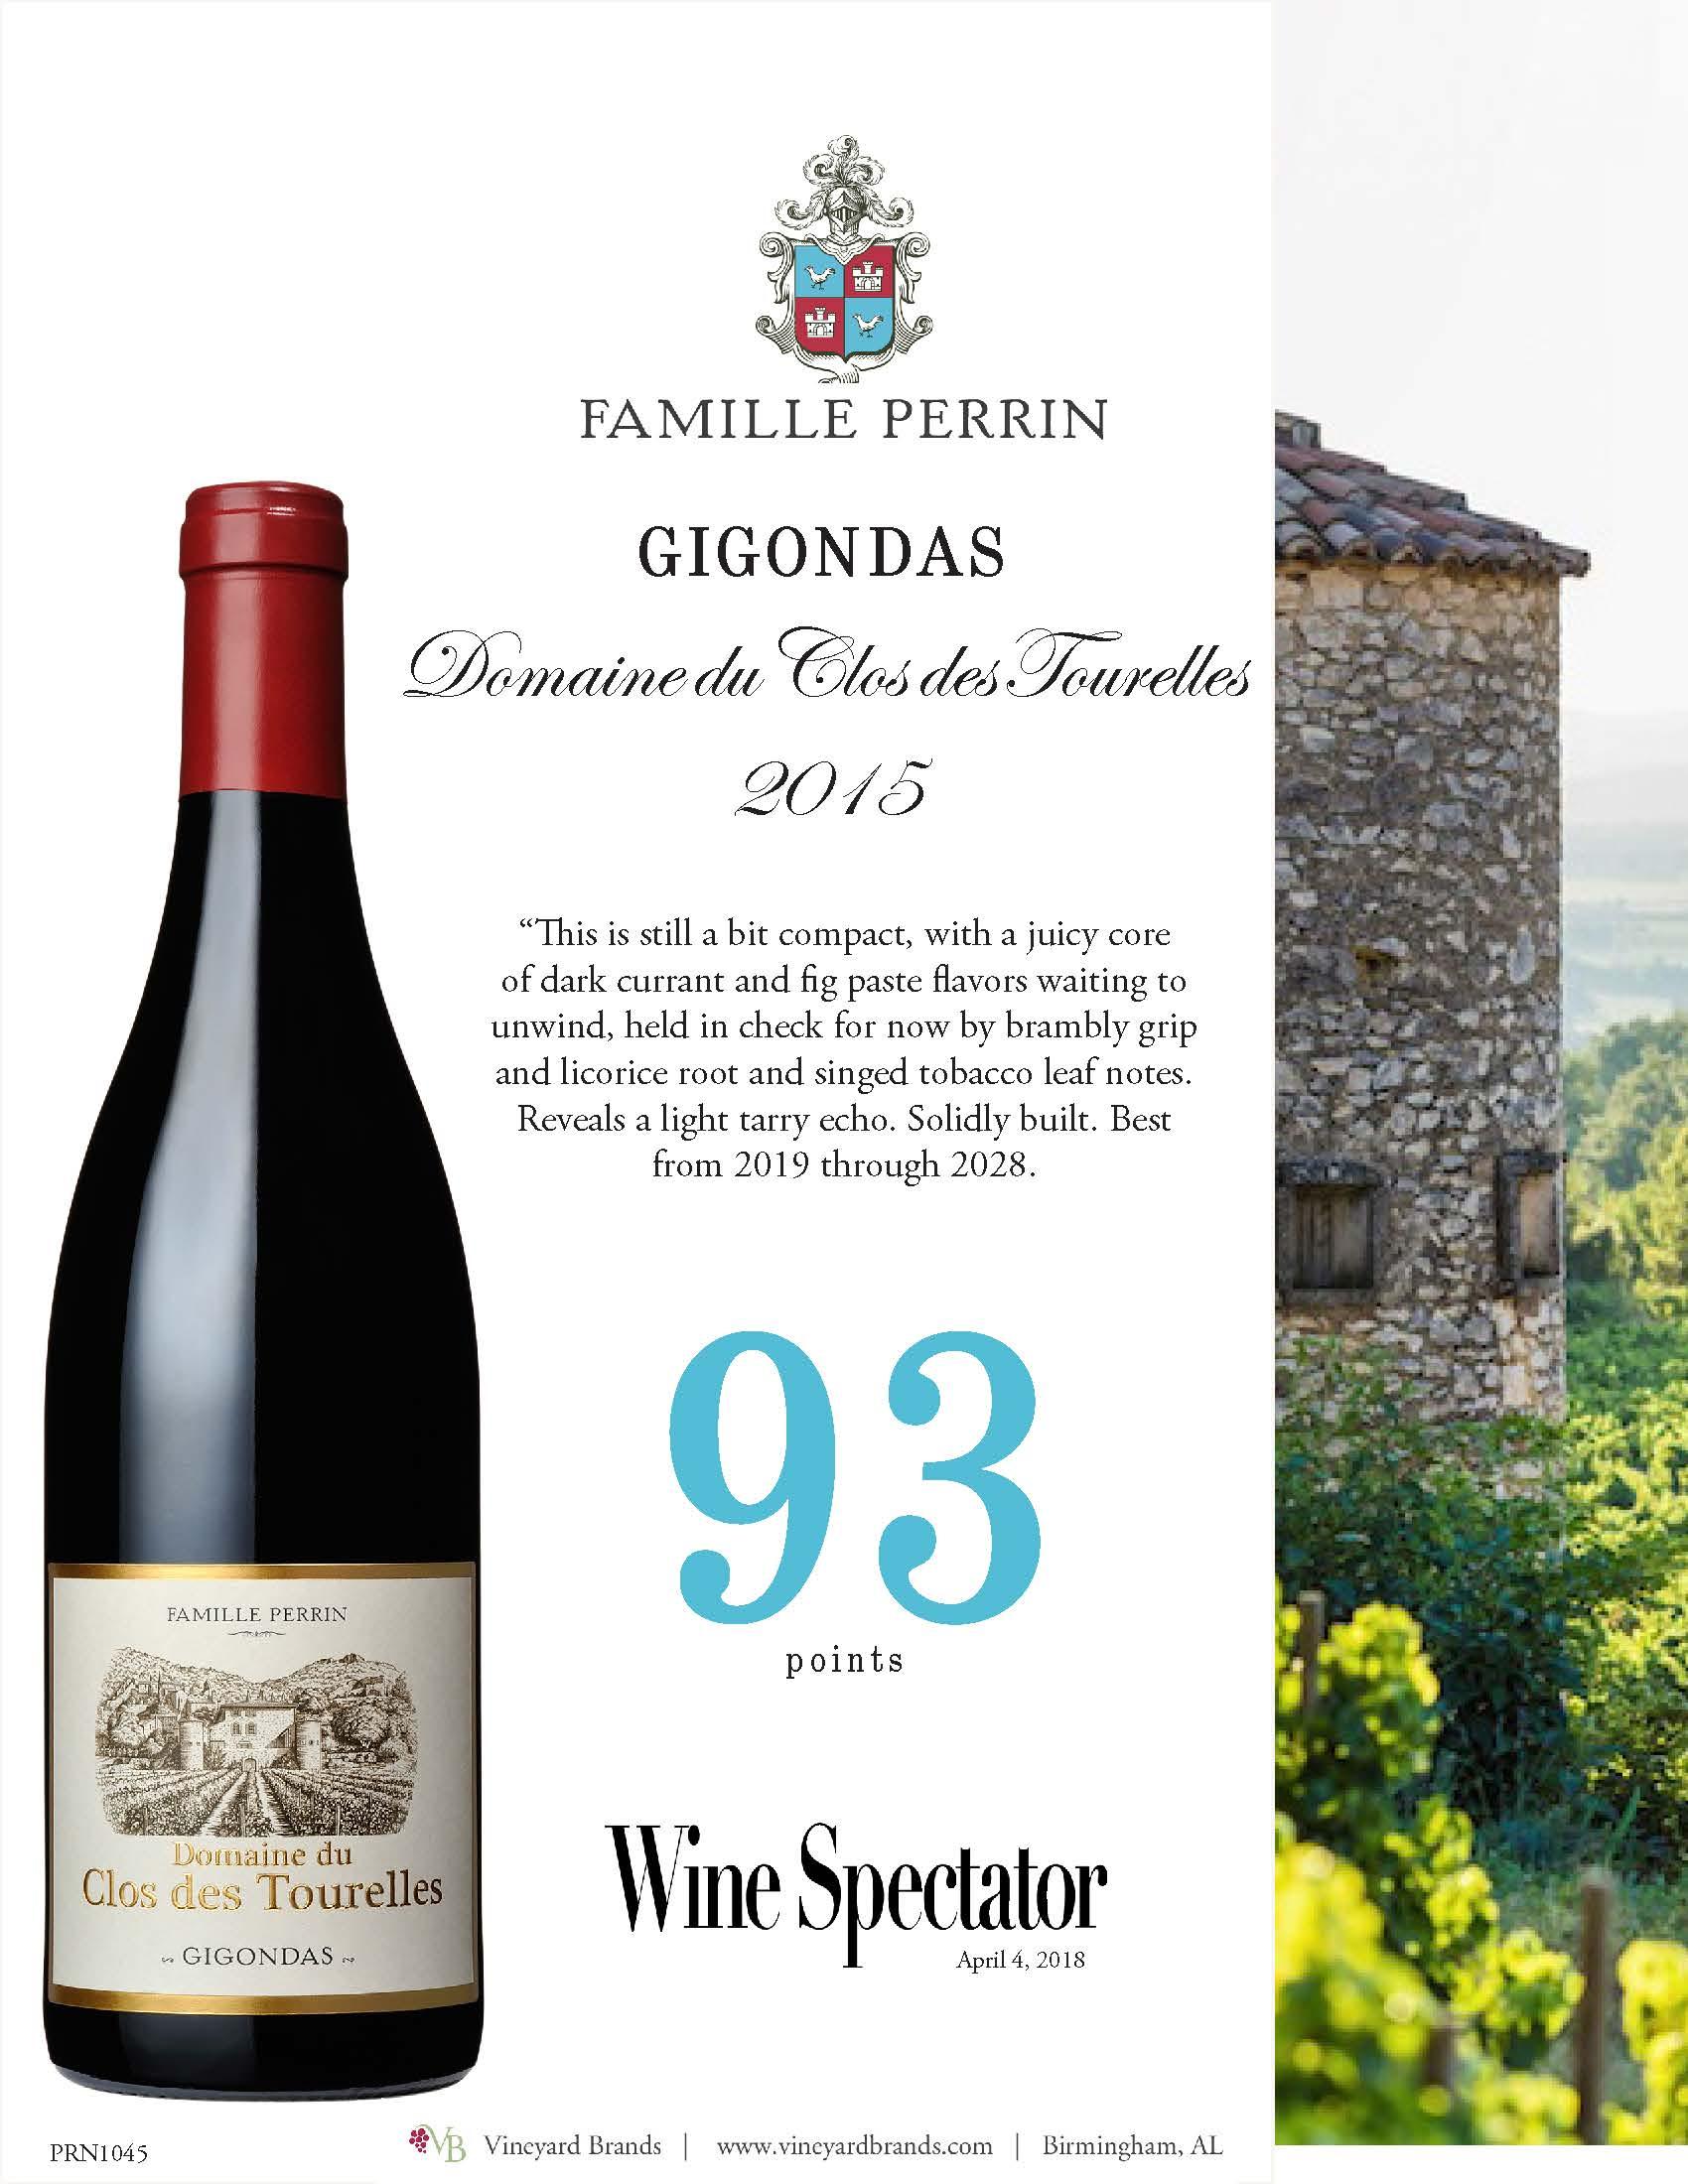 Famille Perrin Gigondas Domaine du Clos des Tourelles 2015.jpg